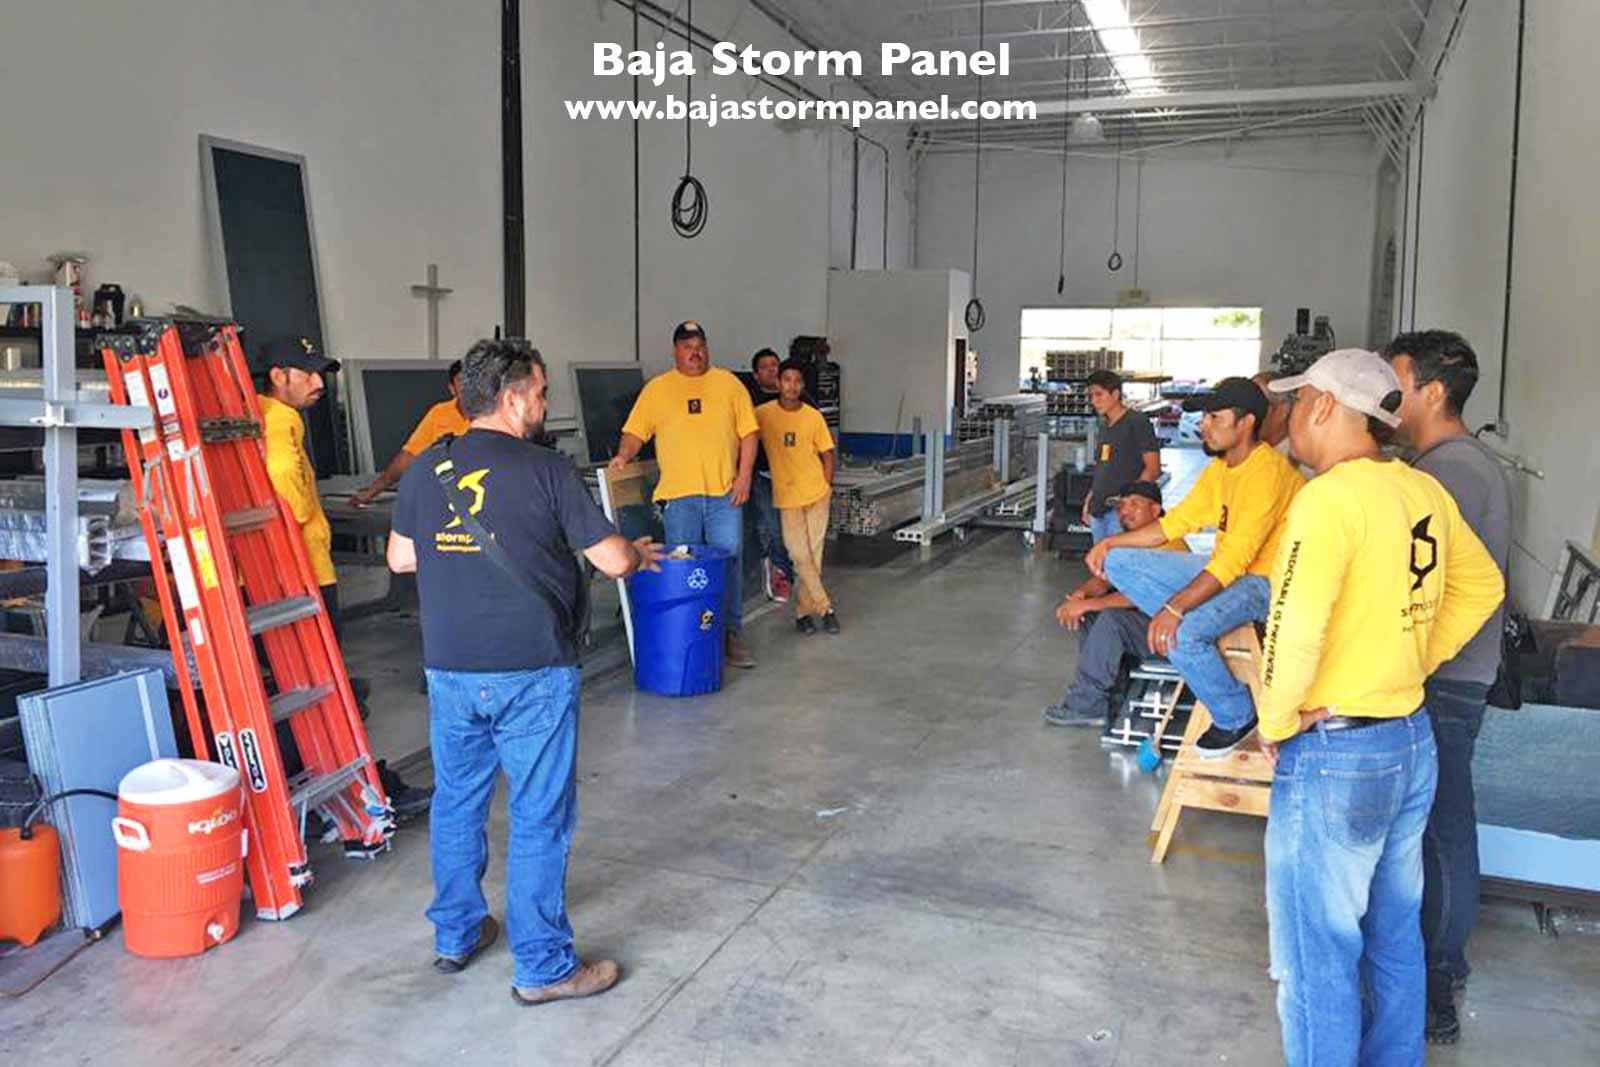 baja-storm-panel-warehouse-team-67938-2